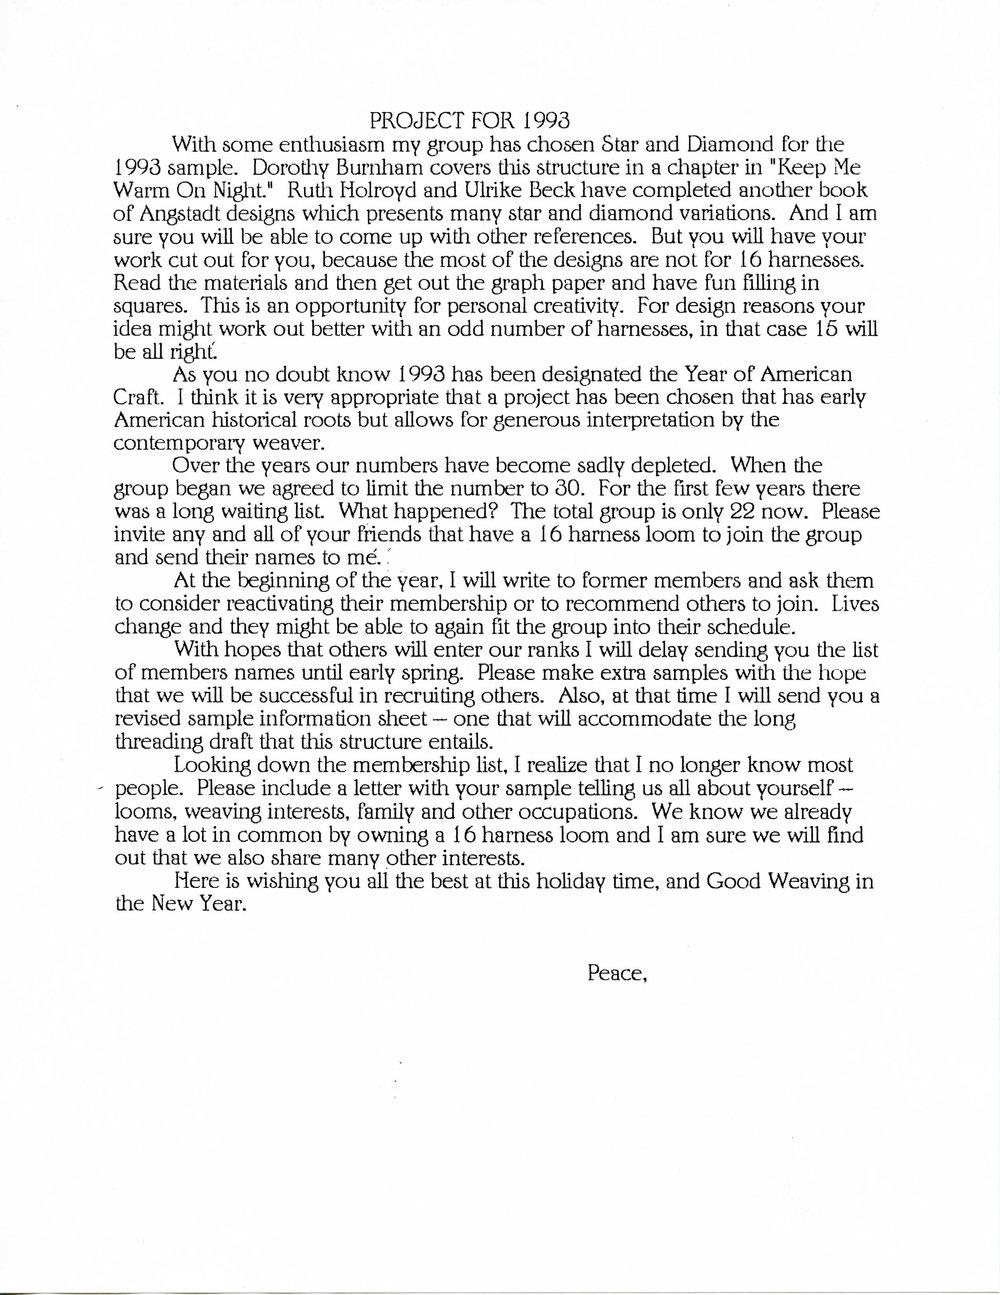 1992_Page_4_Image_0001.jpg